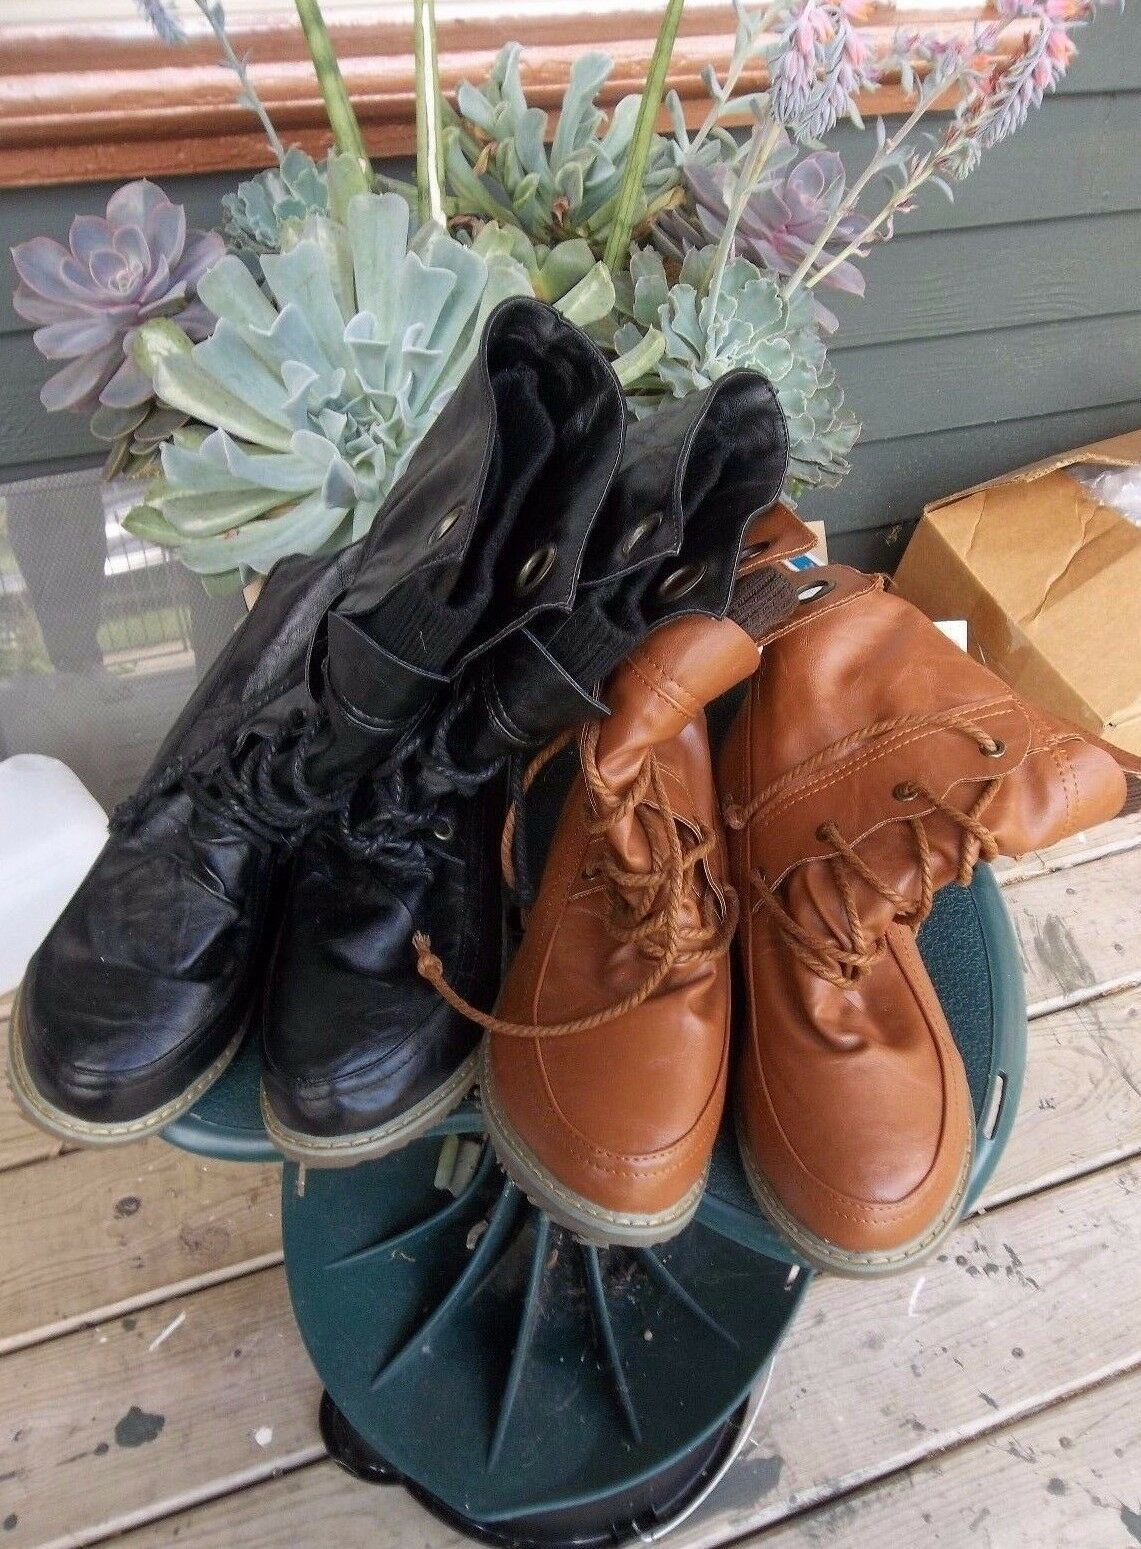 Ladies Black Faux Leather lace up boots Size 8 or Brown Faux Leather Lace Up Boo